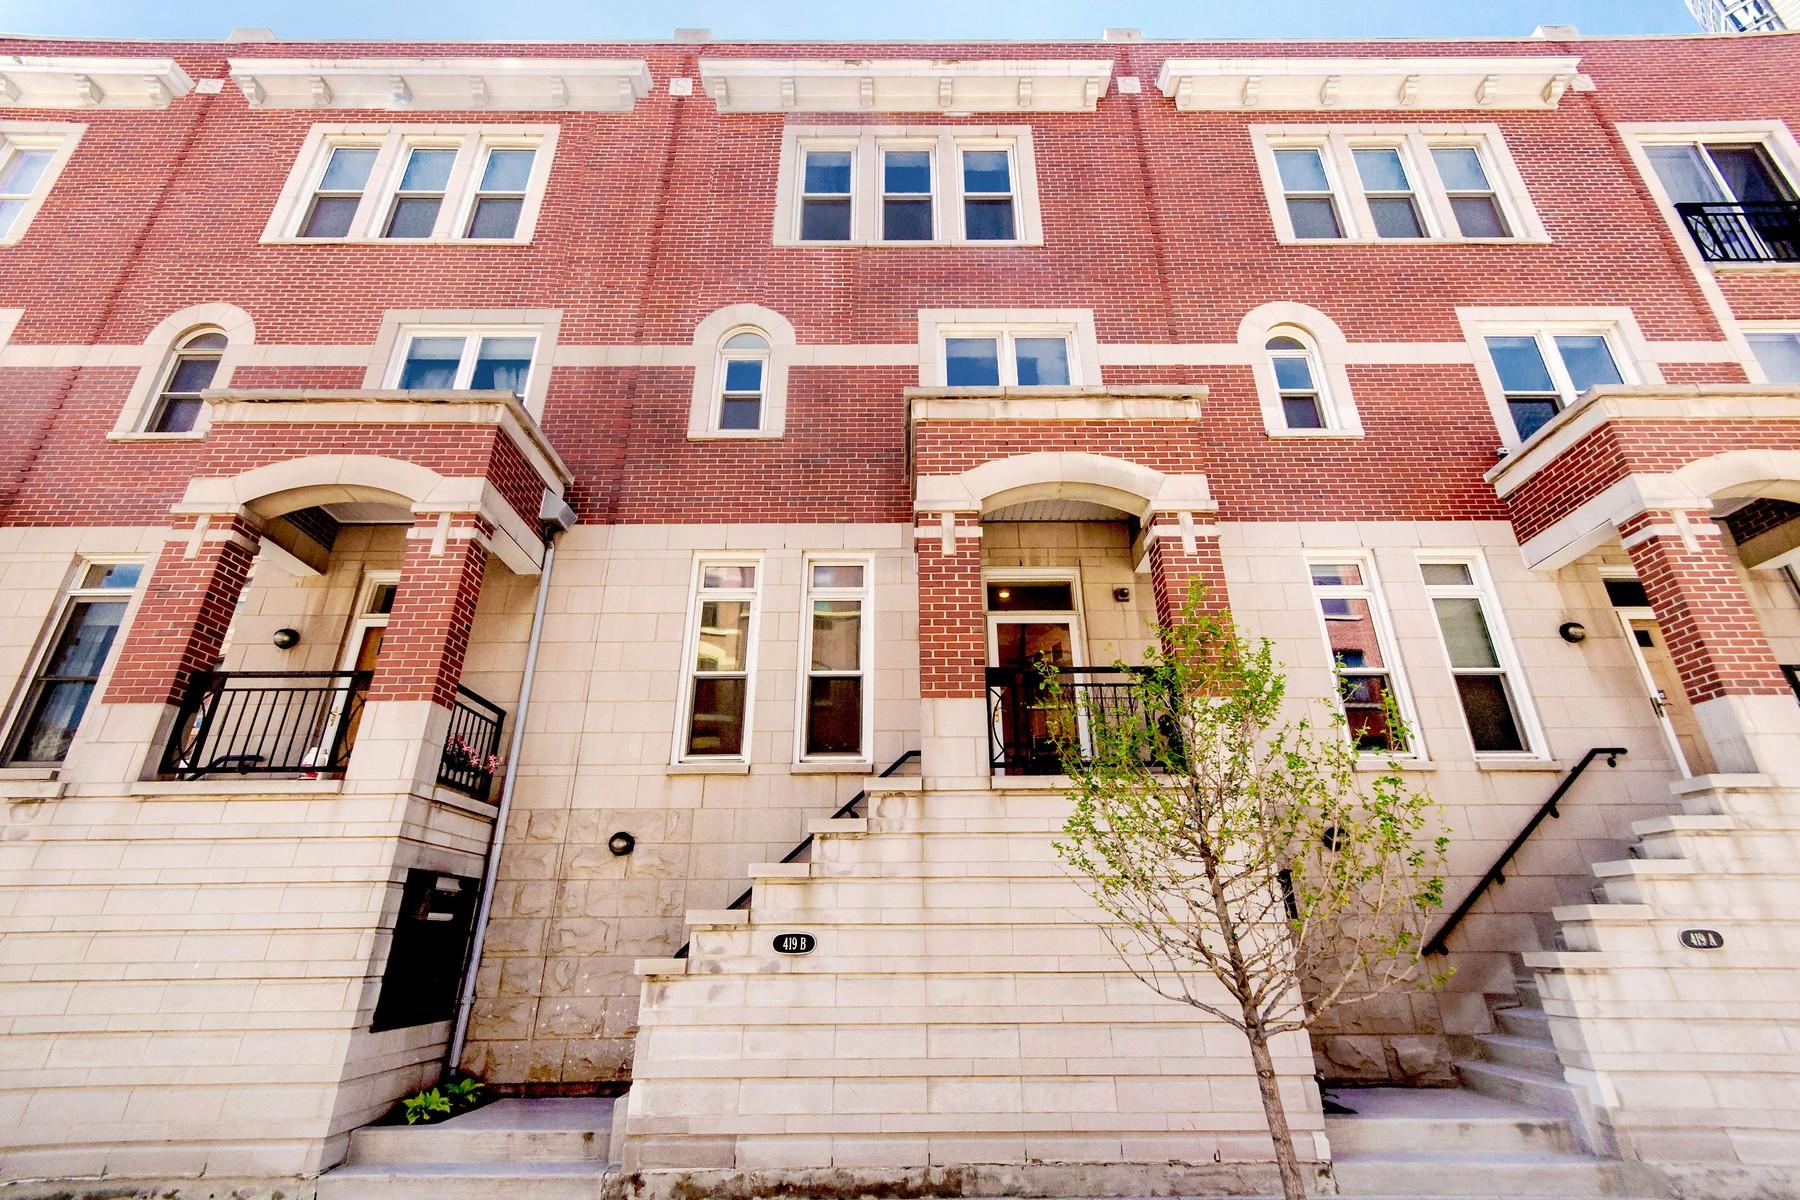 Casa Unifamiliar Adosada por un Venta en Contemporary Sexton Rowhouse 419 W Grand Avenue #B Near North Side, Chicago, Illinois 60654 Estados Unidos